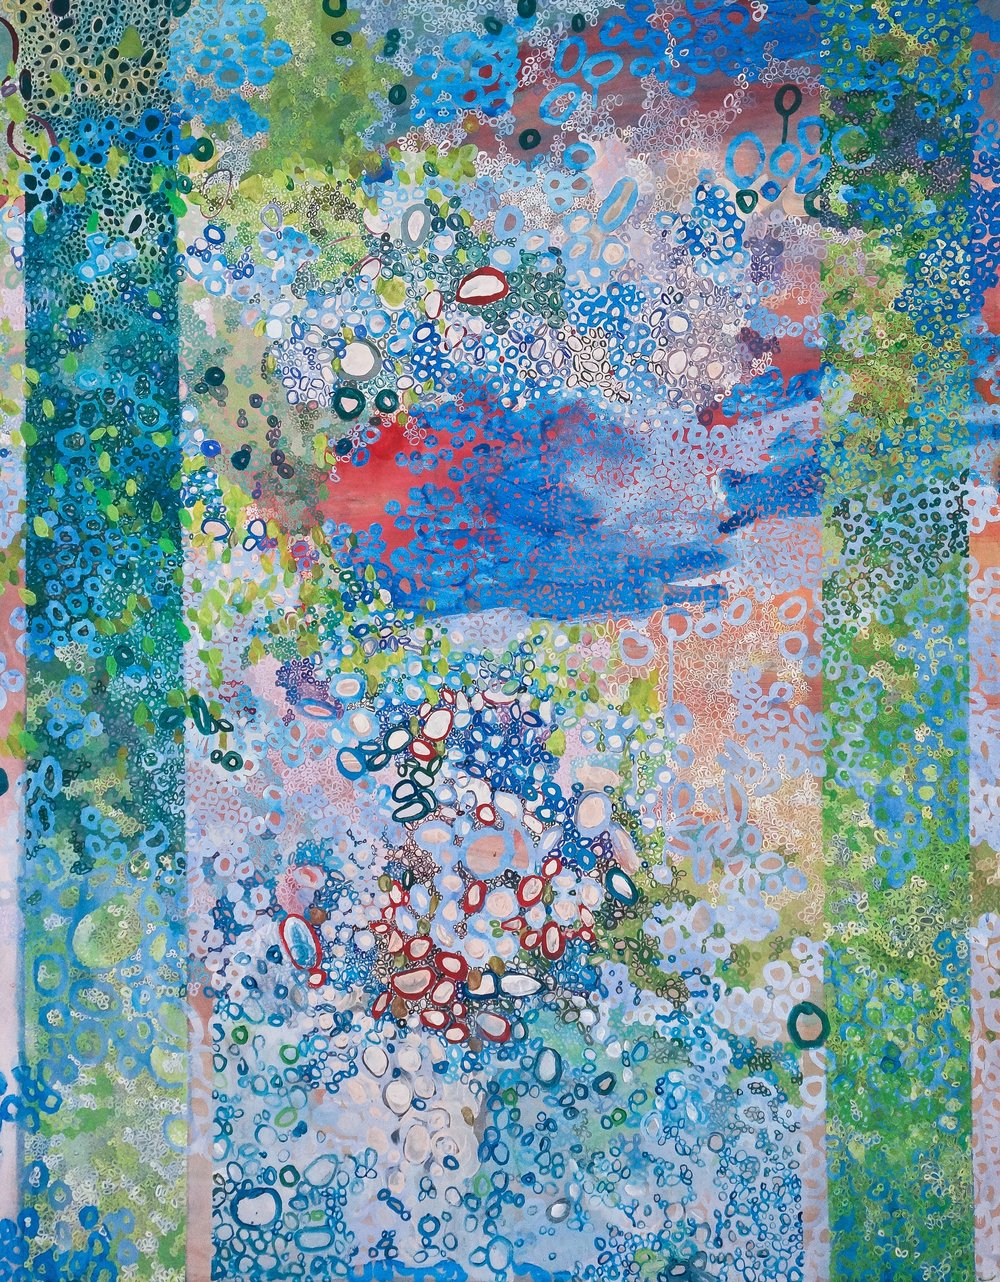 Flenniken Pond, acrylic on canvas, 36 x 48 in, 2016